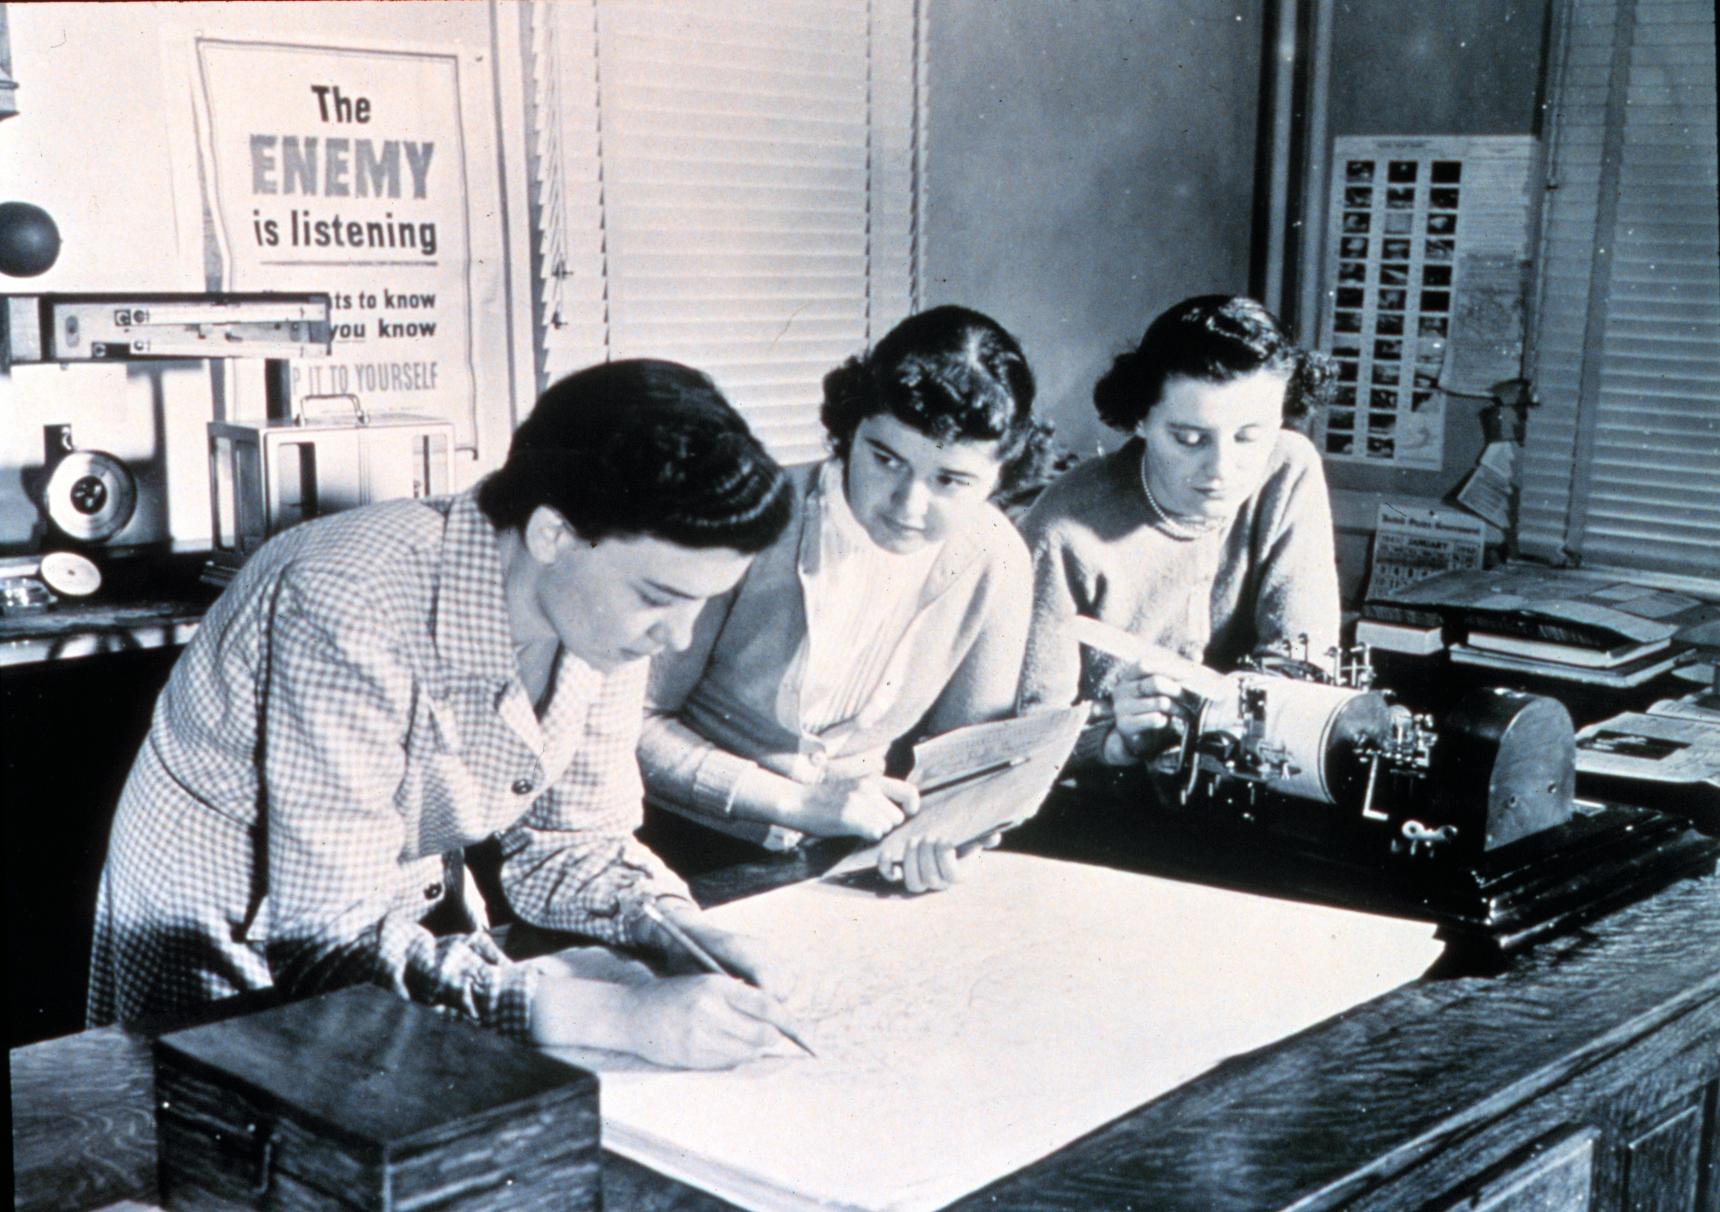 Unidentified women plot an upper air chart, c. 1944. NOAA Photo Library (online at https://www.flickr.com/photos/51647007@N08/5083205985/).